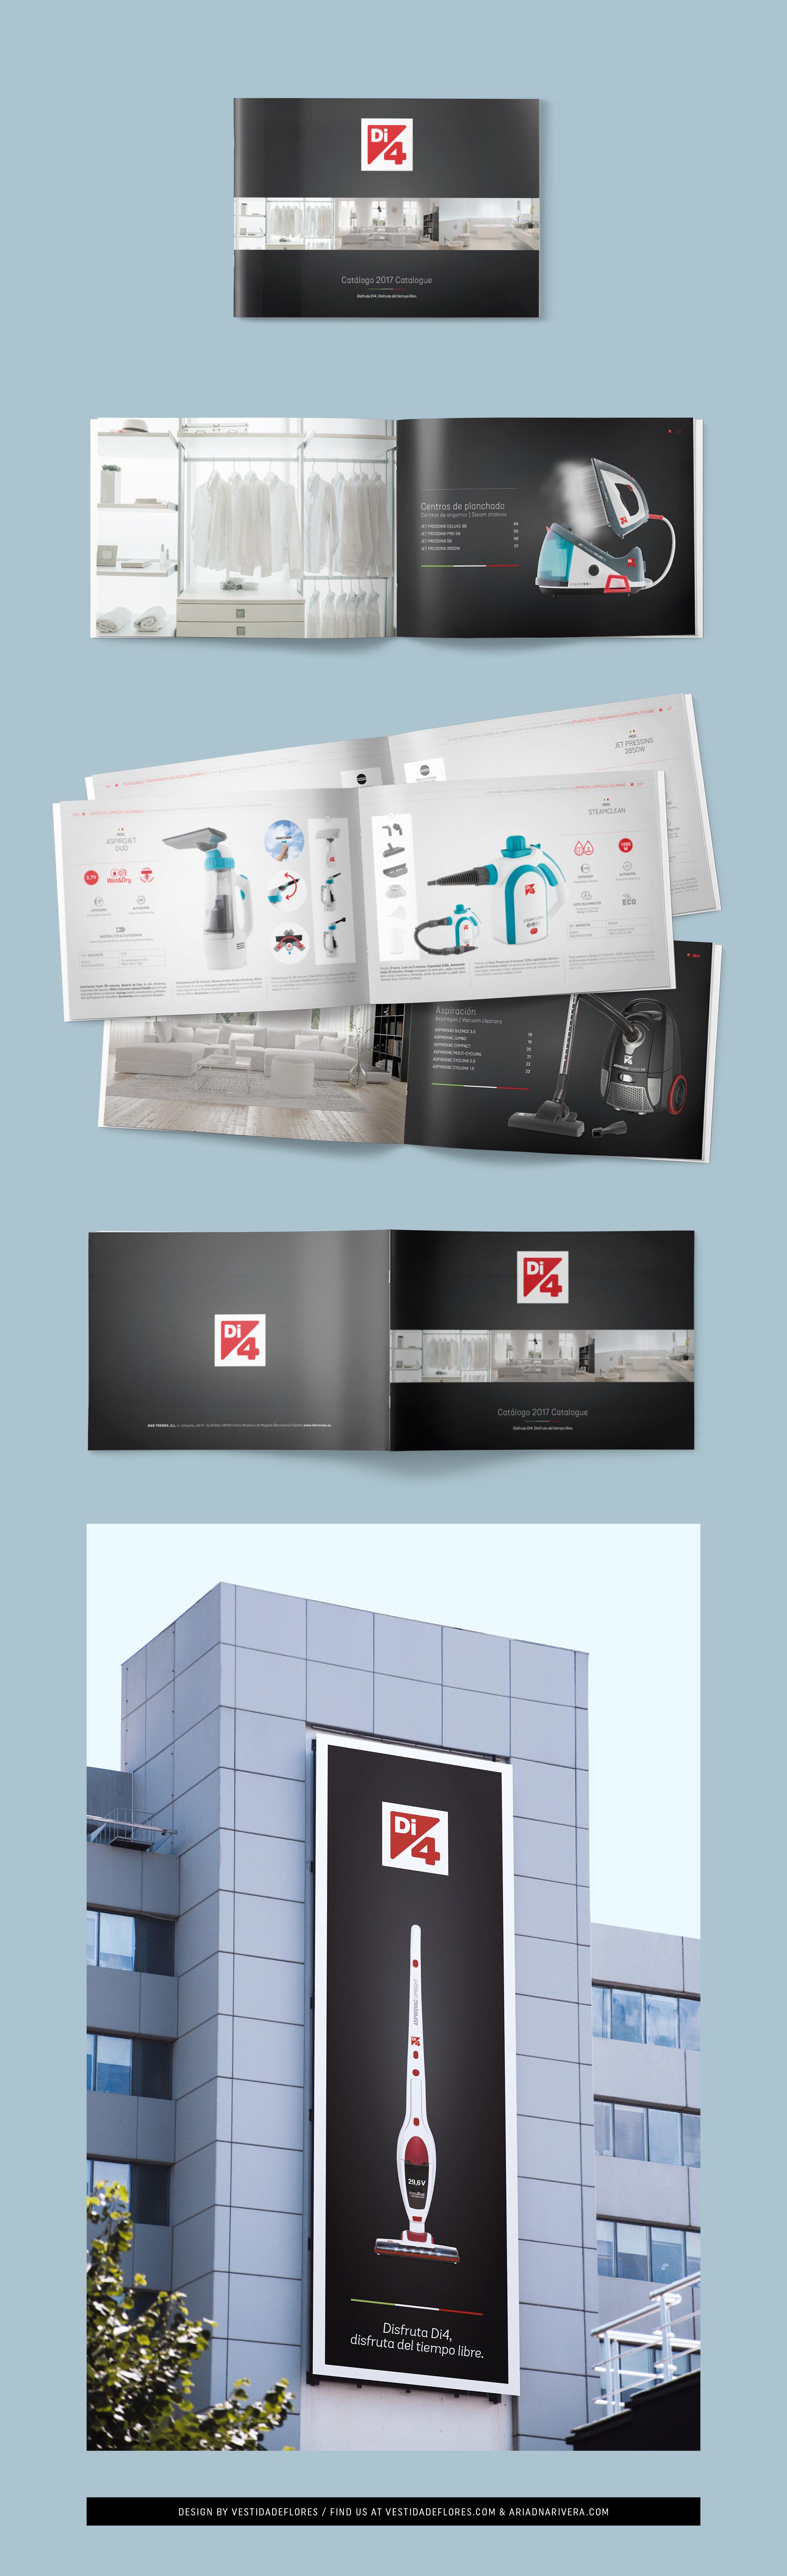 Vestida de flores - Diseño catálogo electrodomésticos Di4